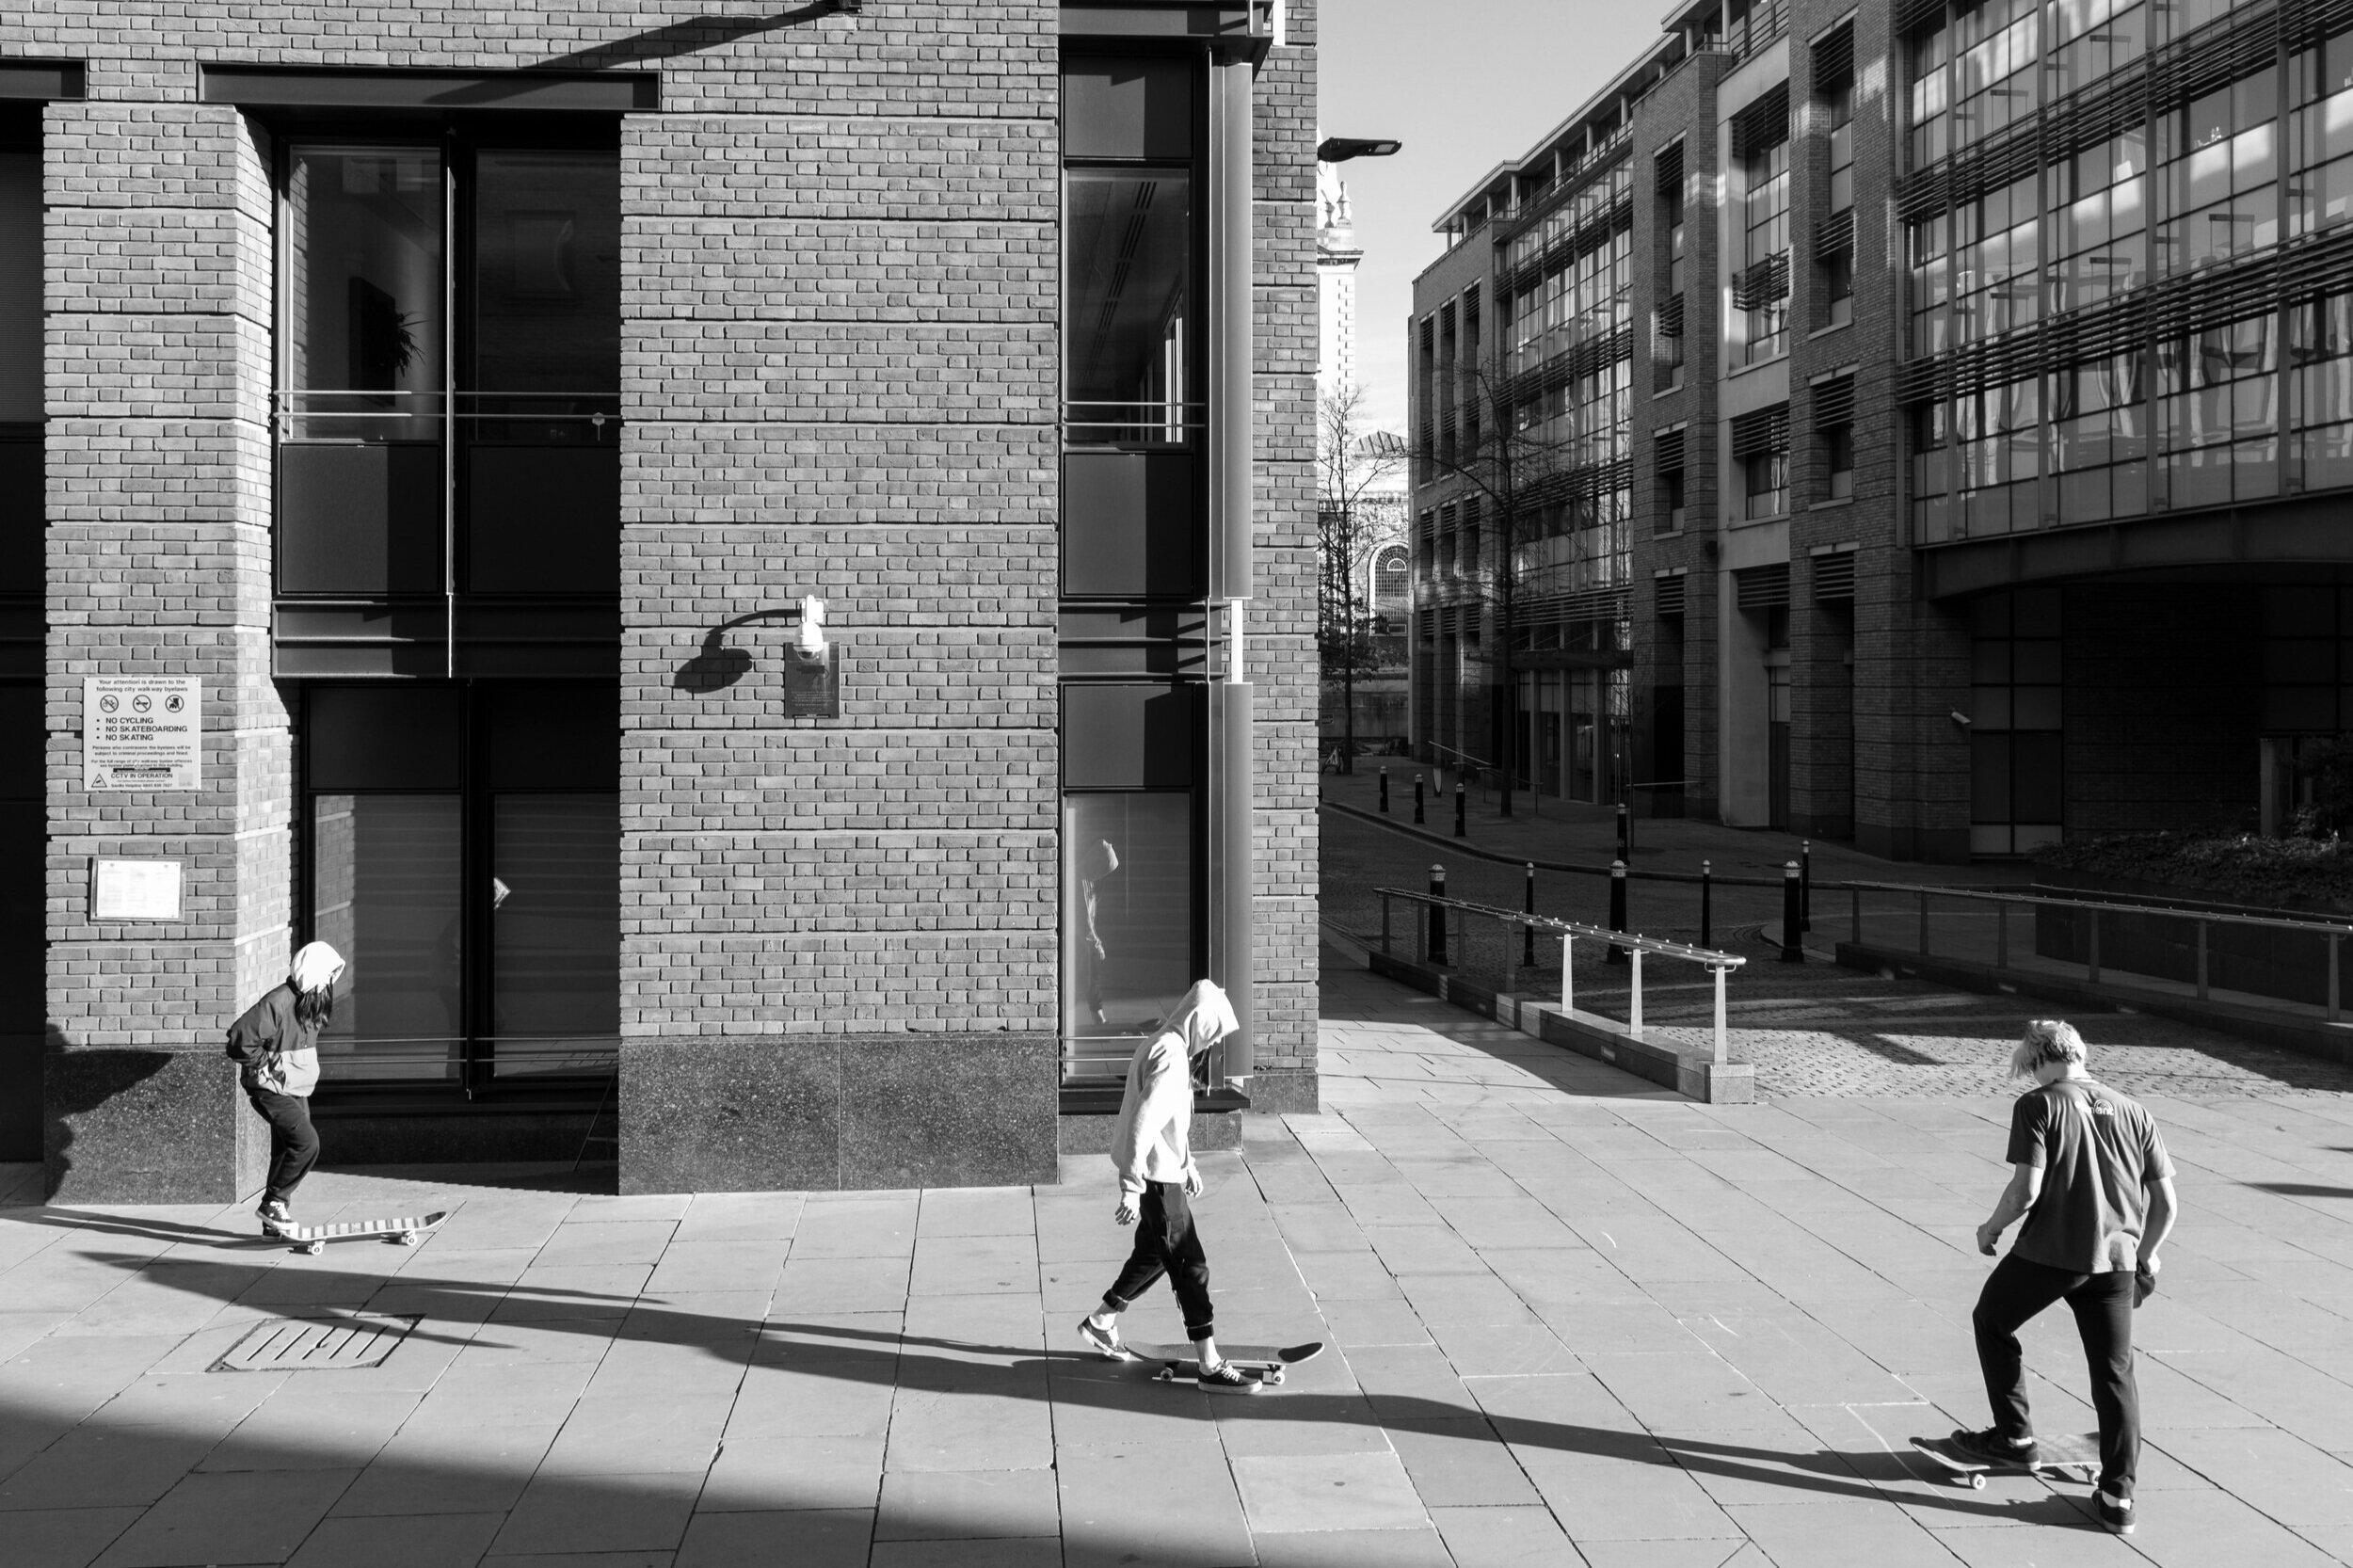 London Street Photography.jpeg